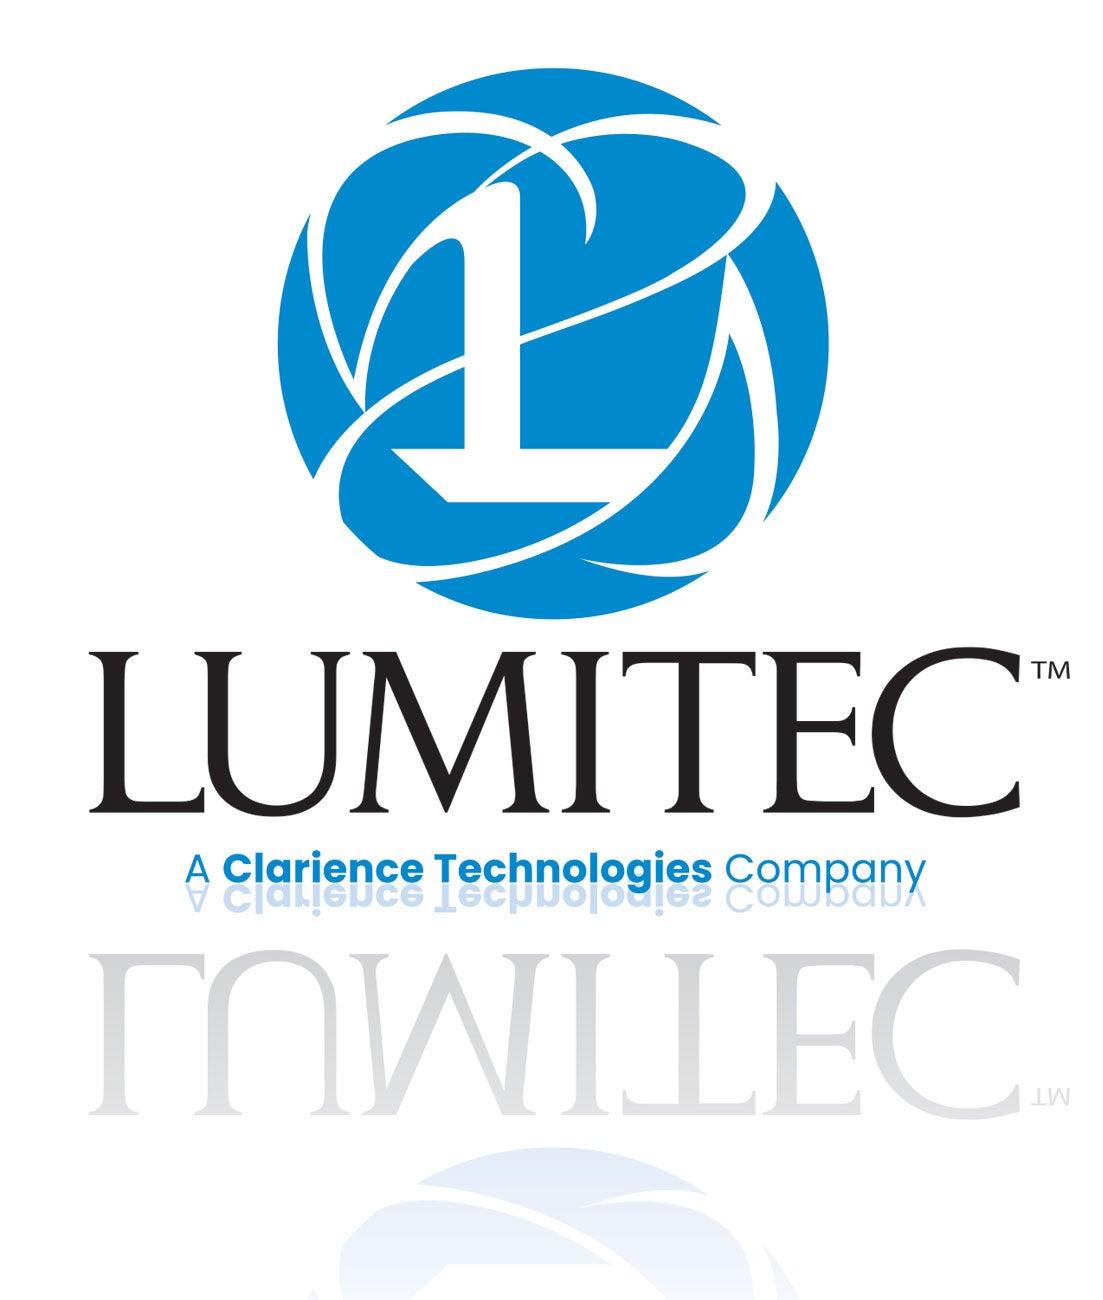 Shining A New Light On Lumitec